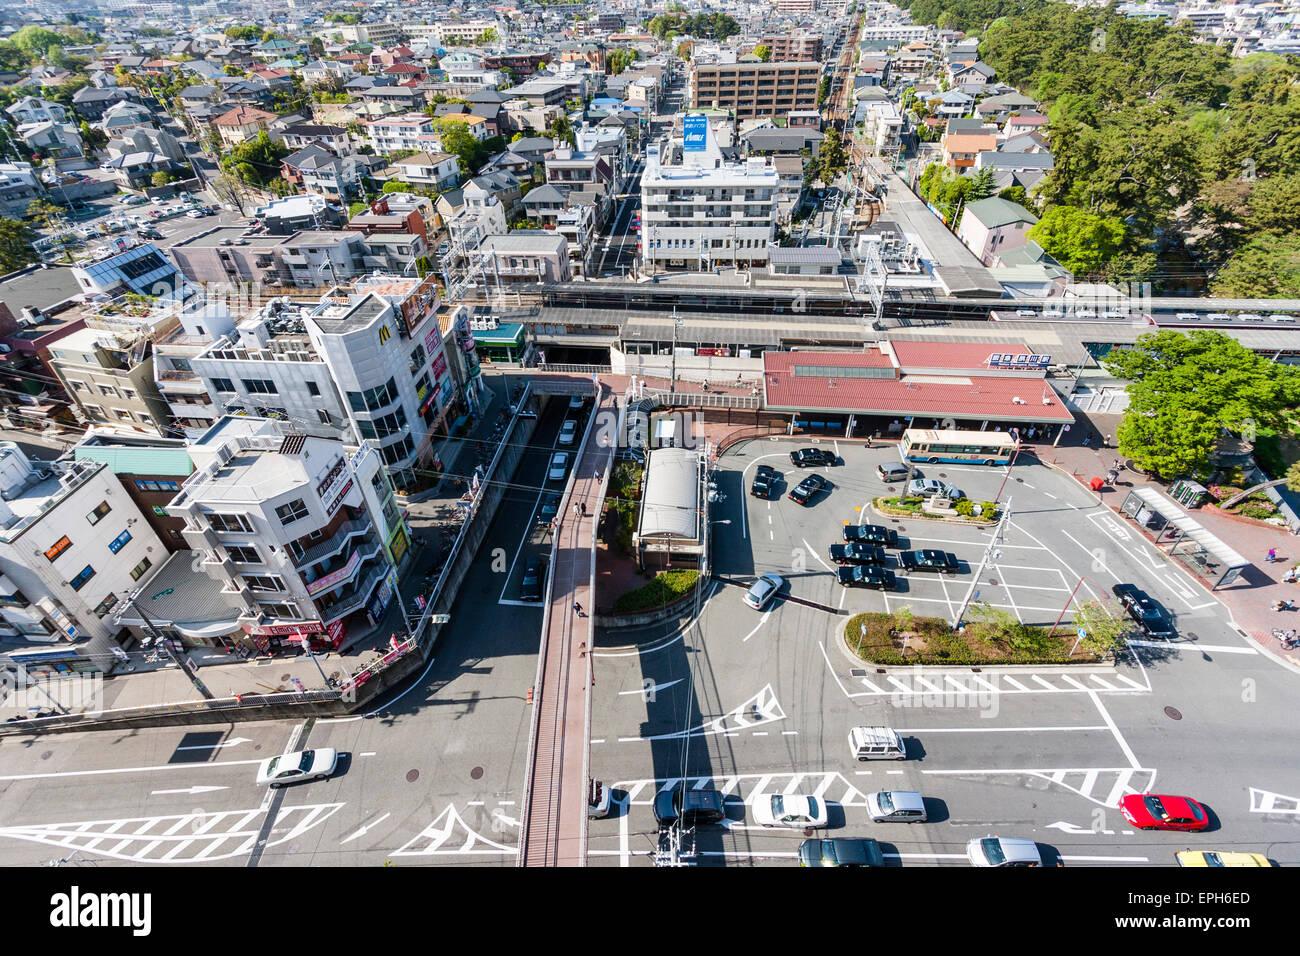 Japan, Nishinomiya, Shukugawa. Ariel view of town, mainly the Hankyu train station. - Stock Image